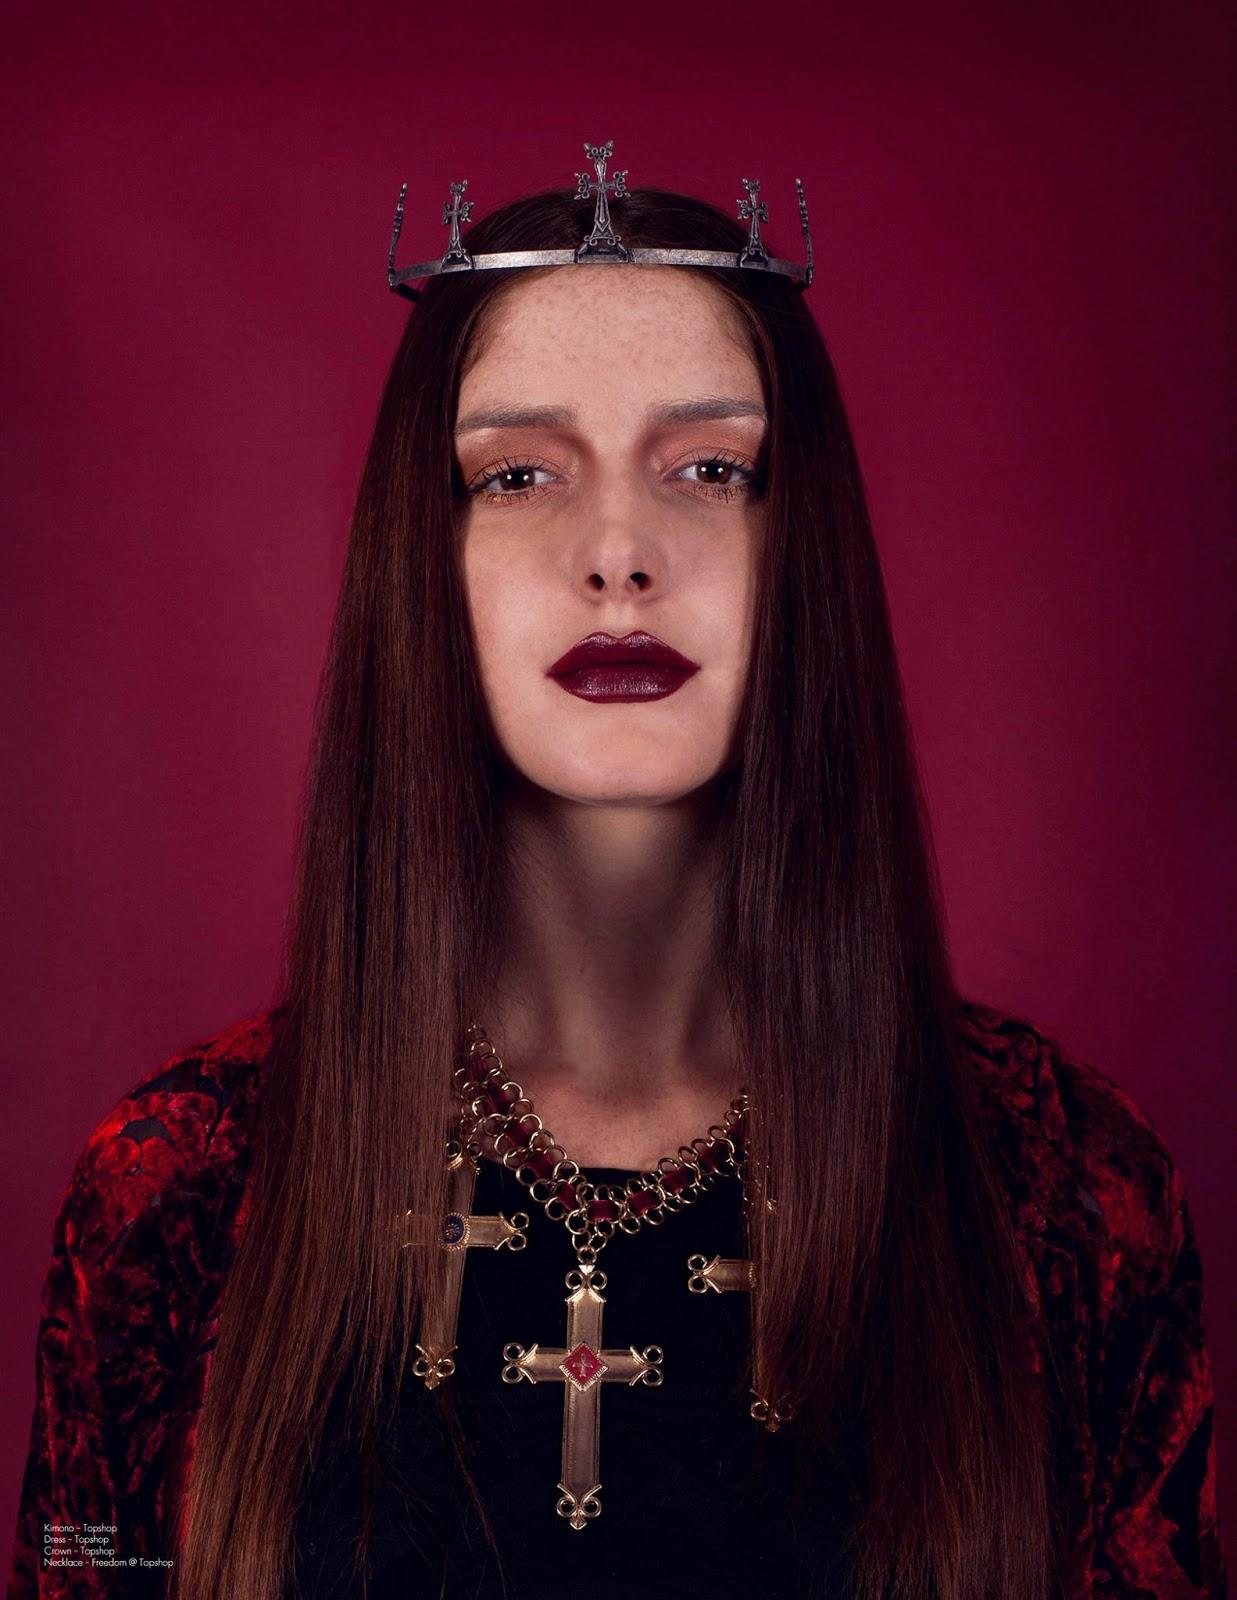 Irina miller in Mindgame Magazine